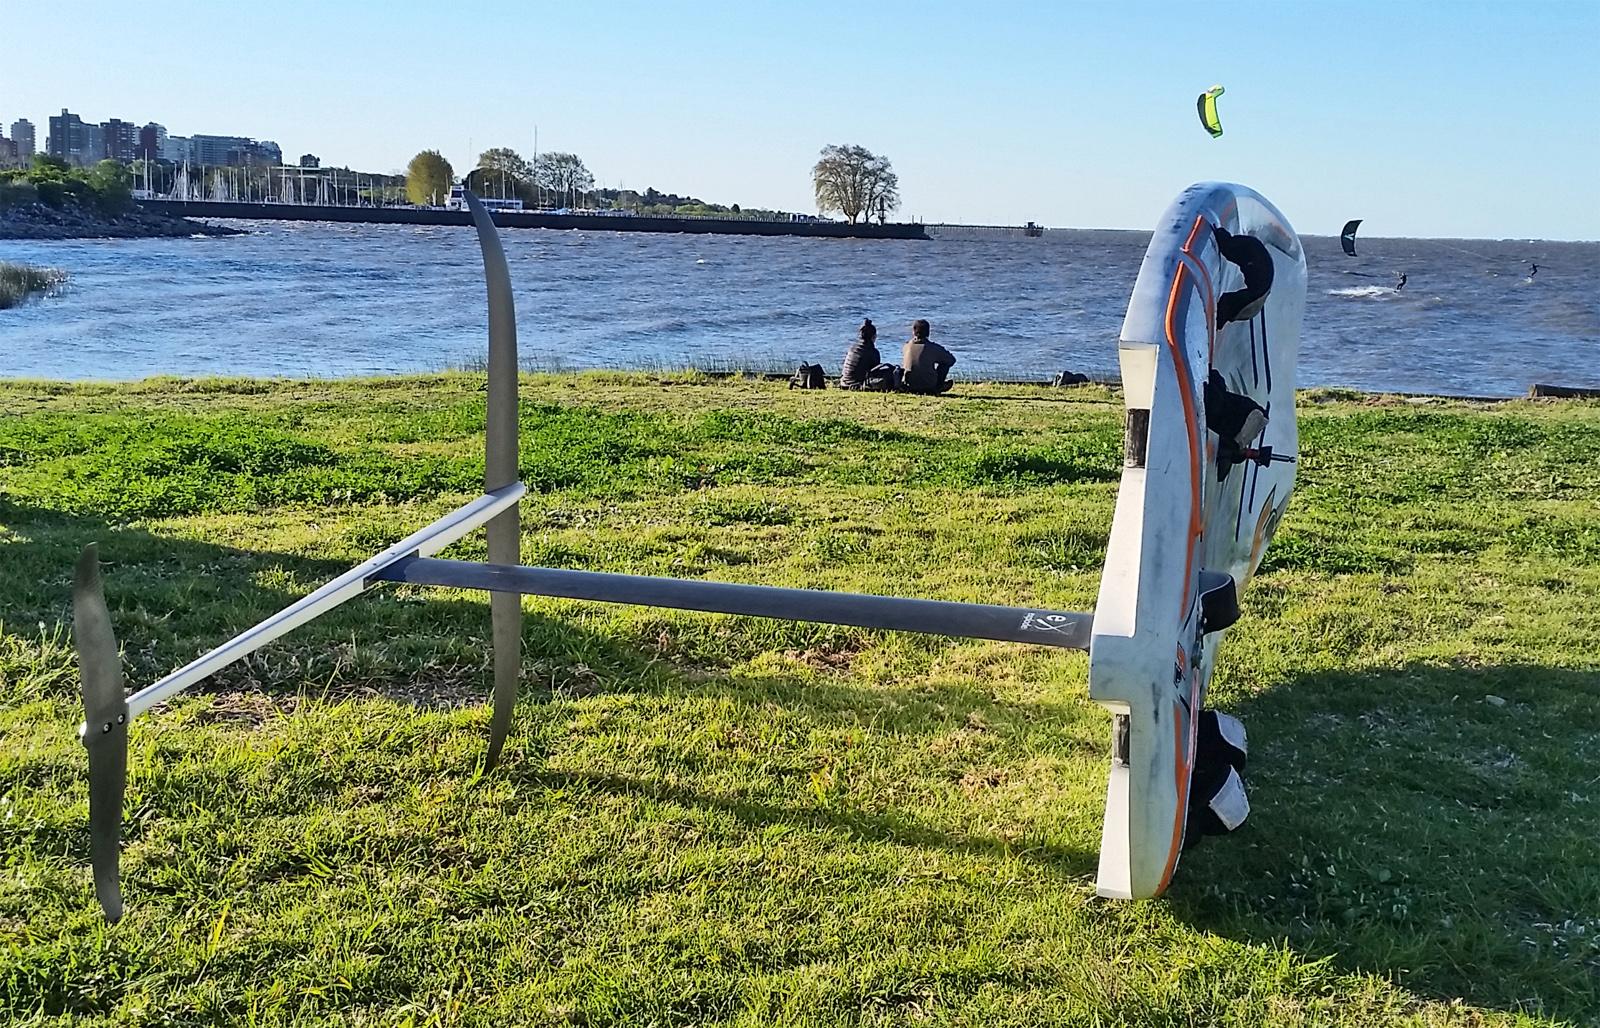 Windsurf Foil Easy Flights Catamaran Racing News Design